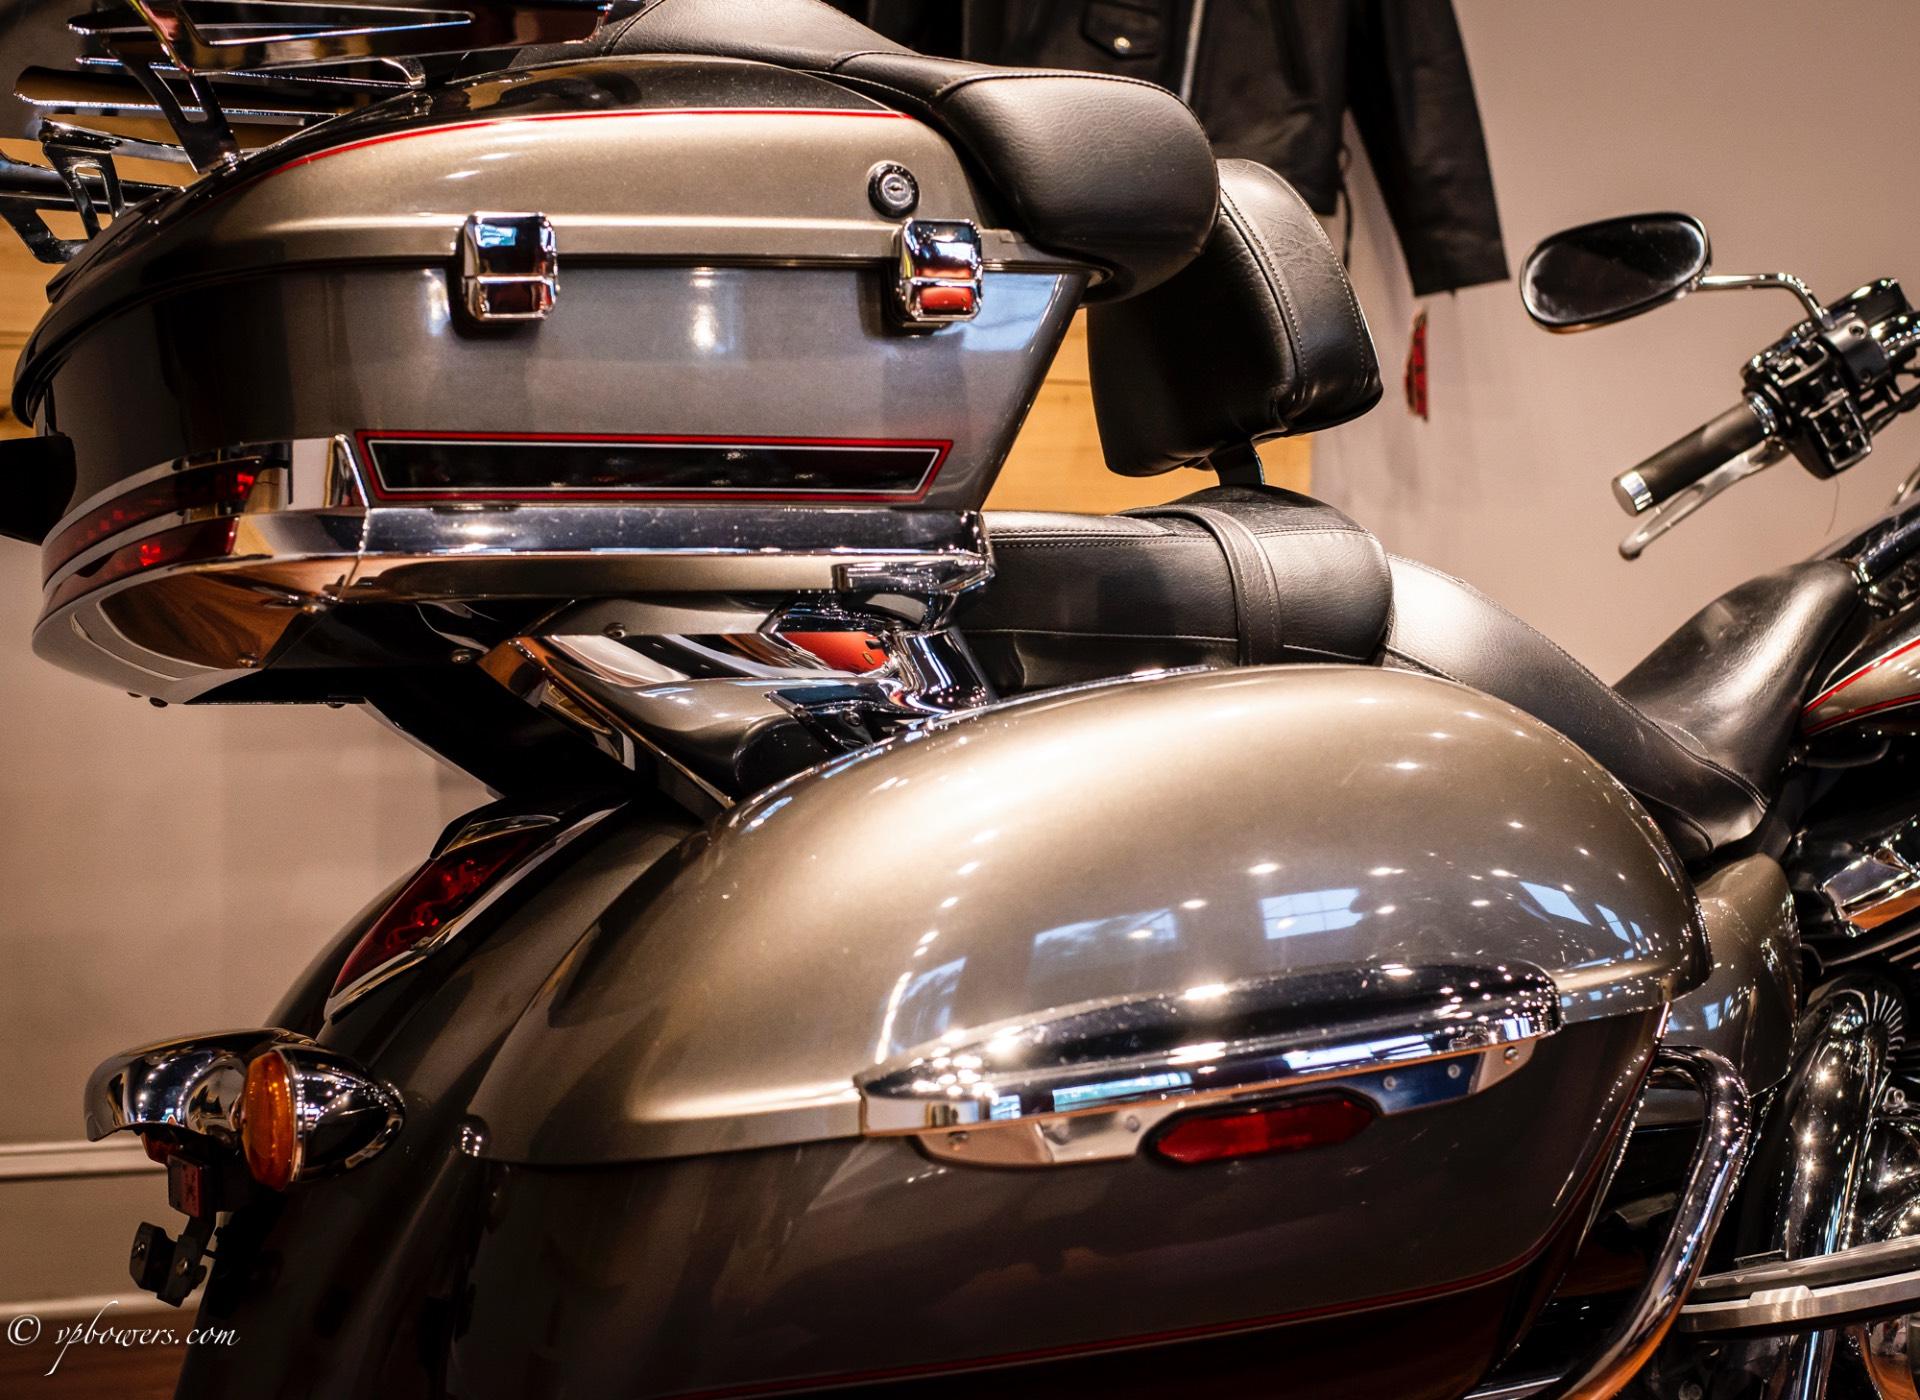 2012 Kawasaki Vulcan 1700 Voyager Abs Motorcycles Mobile Alabama